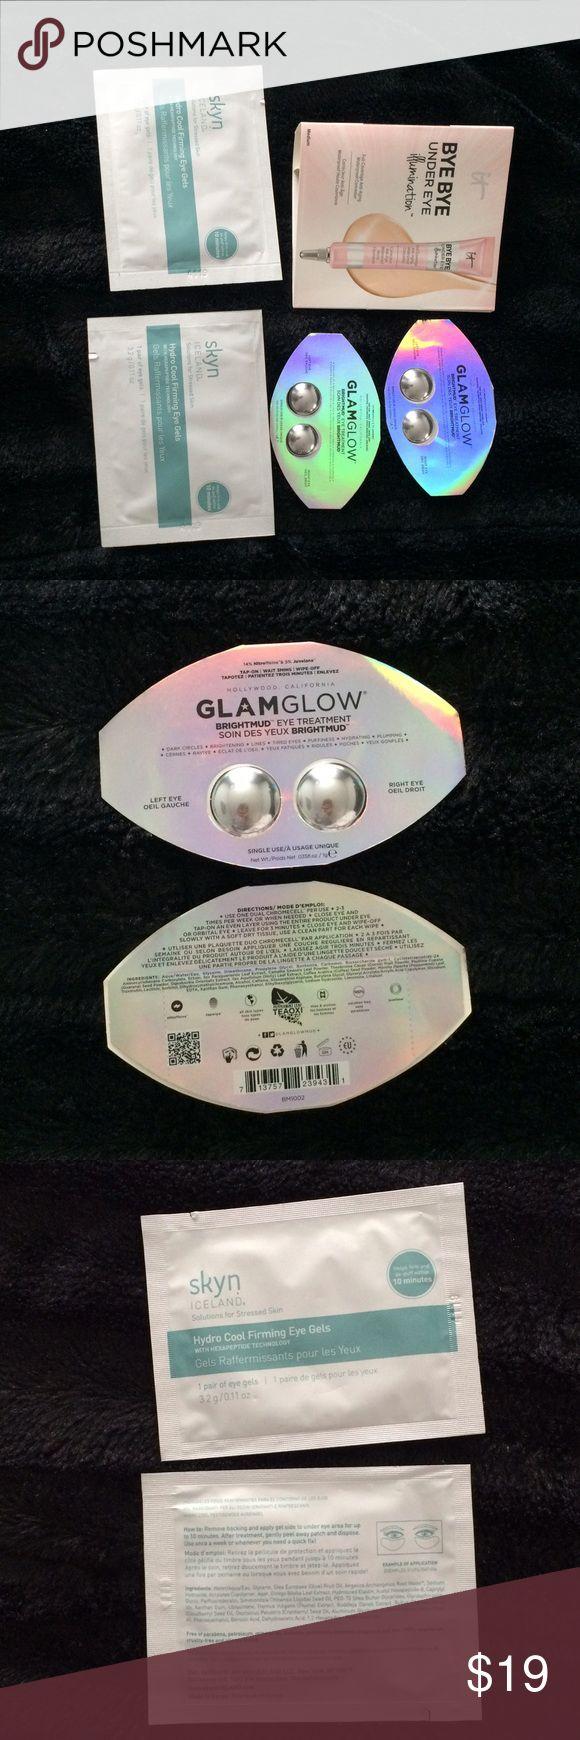 ‼️last price‼️5 luxury eye products 2 Glam Glow brightmud eye treatments, dark circles, brightening,tired eyes, puffiness, hydrating, plumping,✅ 2 skin Iceland hydro cool firming eye gel, ✅ 1 Bye bye under eye illumination, full coverage anti-aging waterproof concealer , hydrolyzed collagen ,peptides , hyaluronic acid, antioxidants, .... ✅ make me offer✅ Makeup Eye Primer